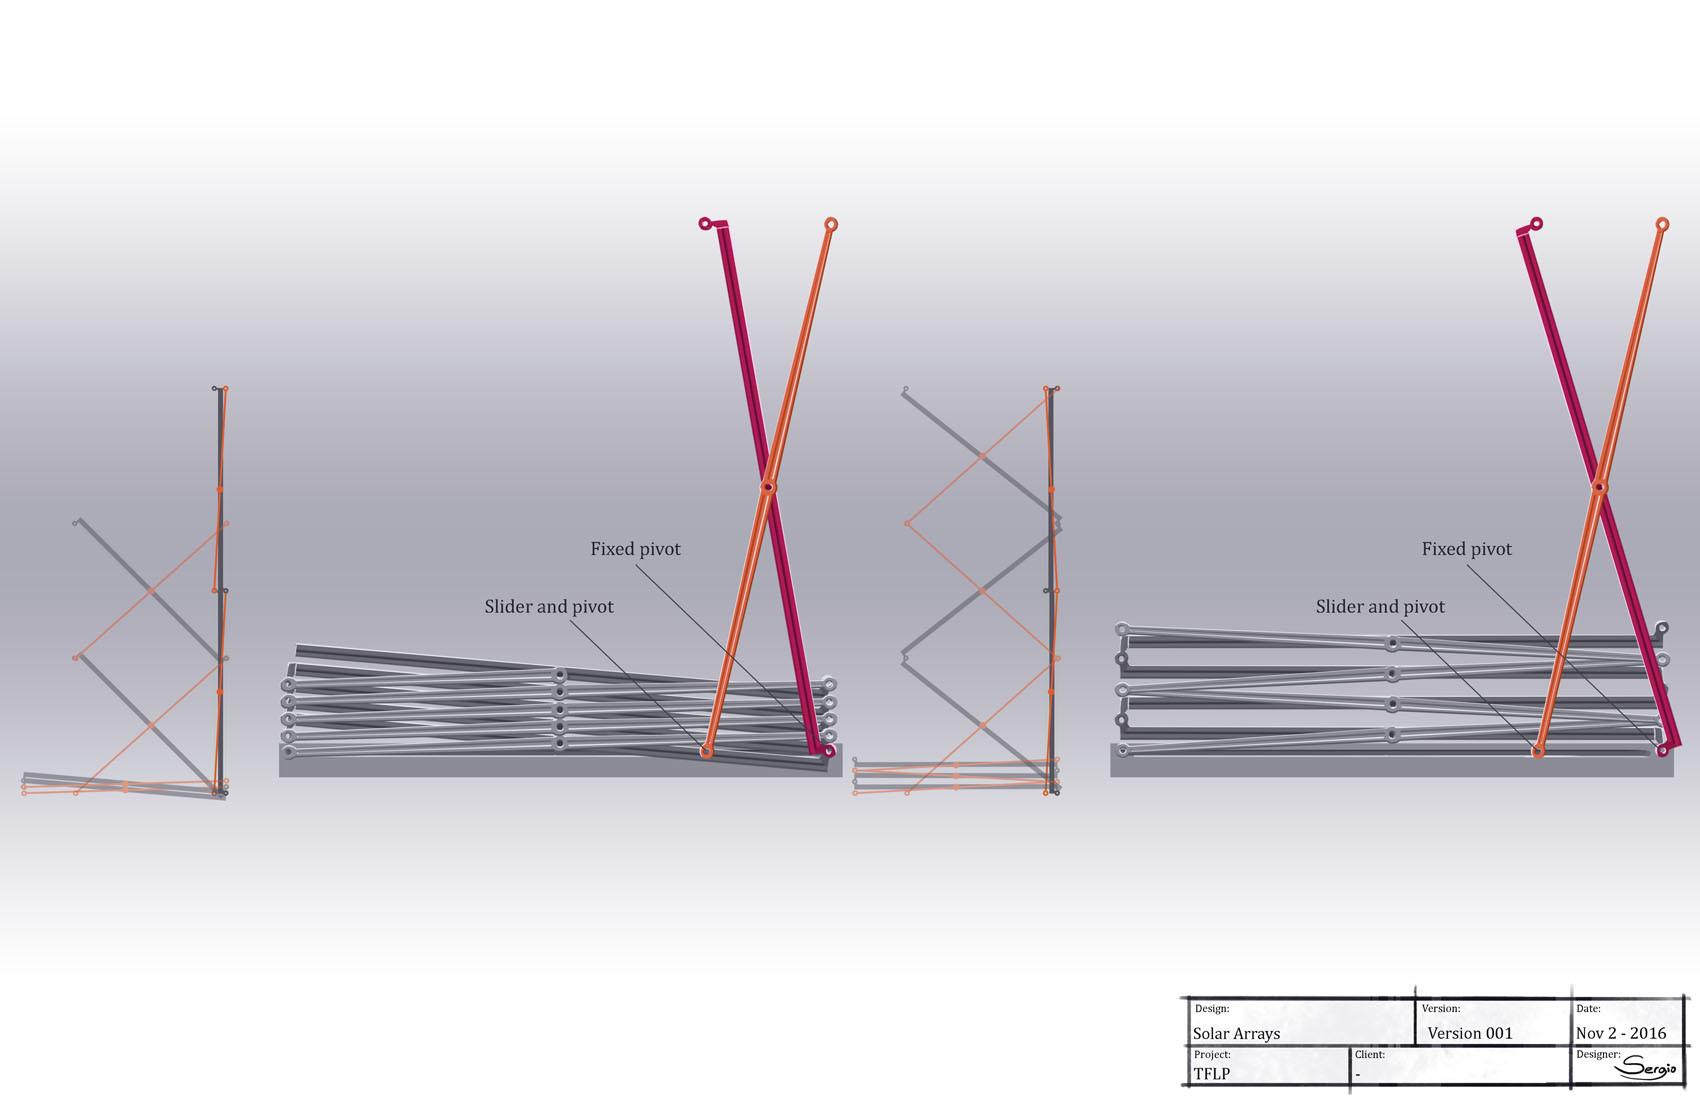 Sergio botero tflp ipv solar arrays sketch